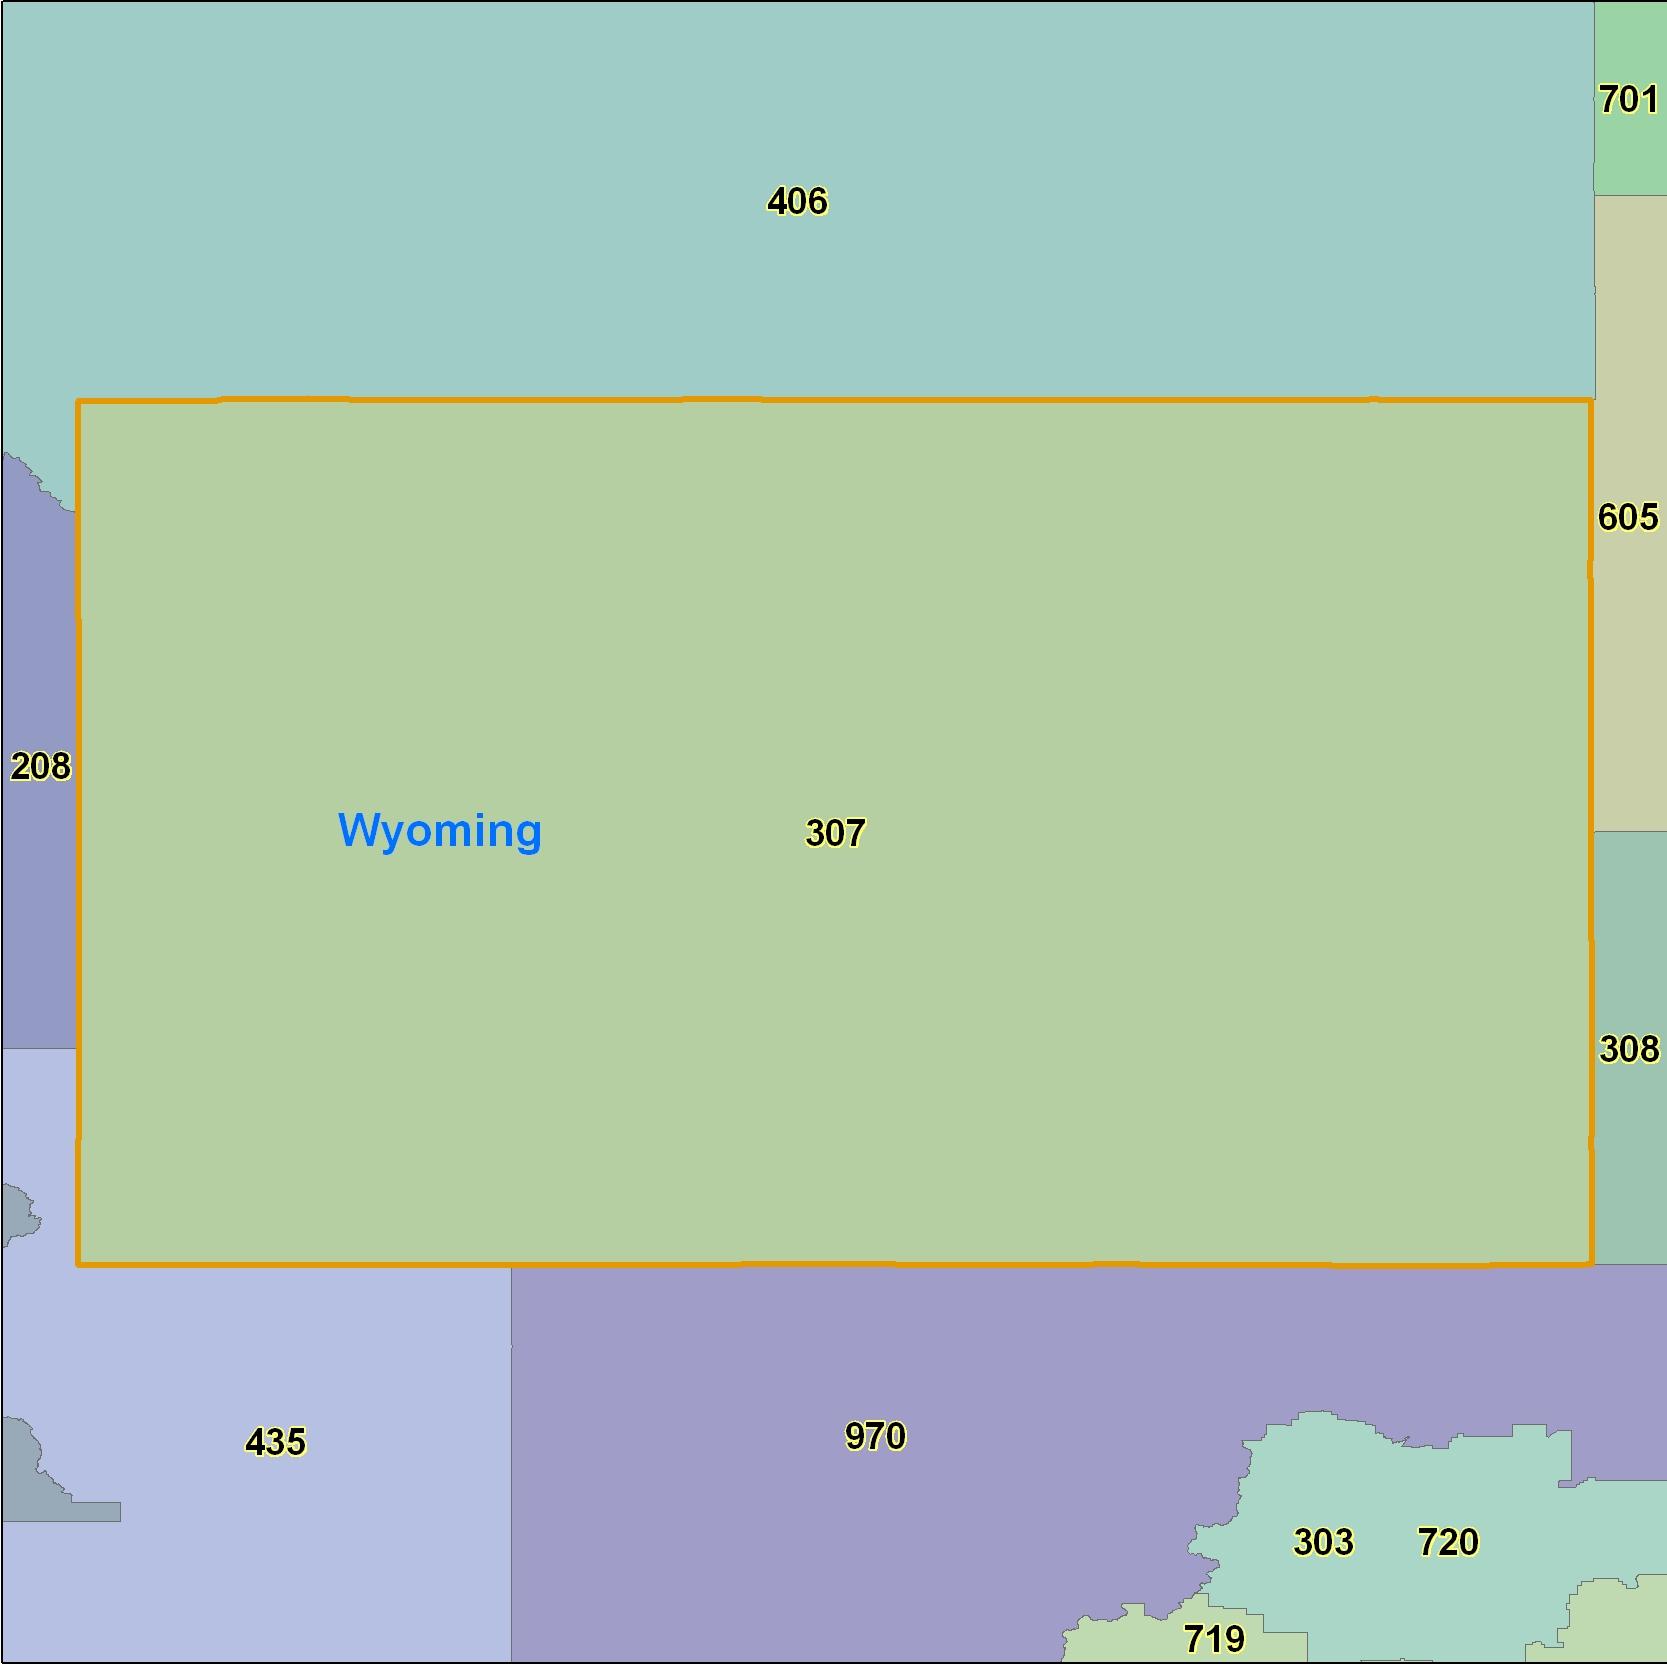 Wyoming Area Code Maps Wyoming Telephone Area Code Maps Free - 435 area code